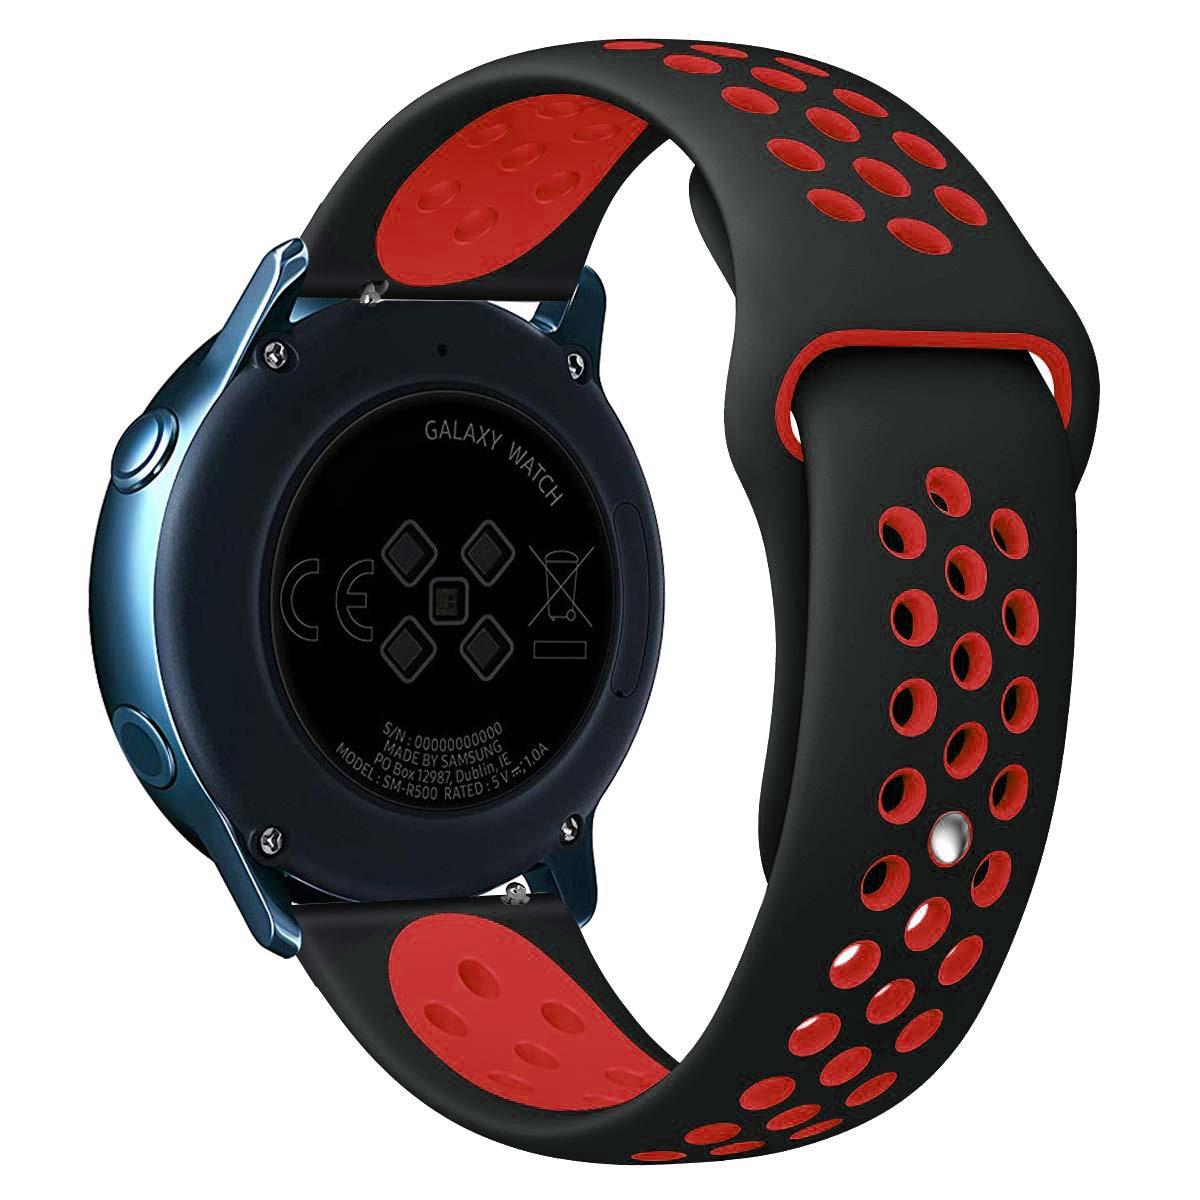 Ремешок для часов Huawei GT/2/2E/Pro, браслет для Gear s3 Frontier Samsung Galaxy watch 3/46 мм/42 мм/Active 2 40 мм 44 мм, 20 мм/22 мм